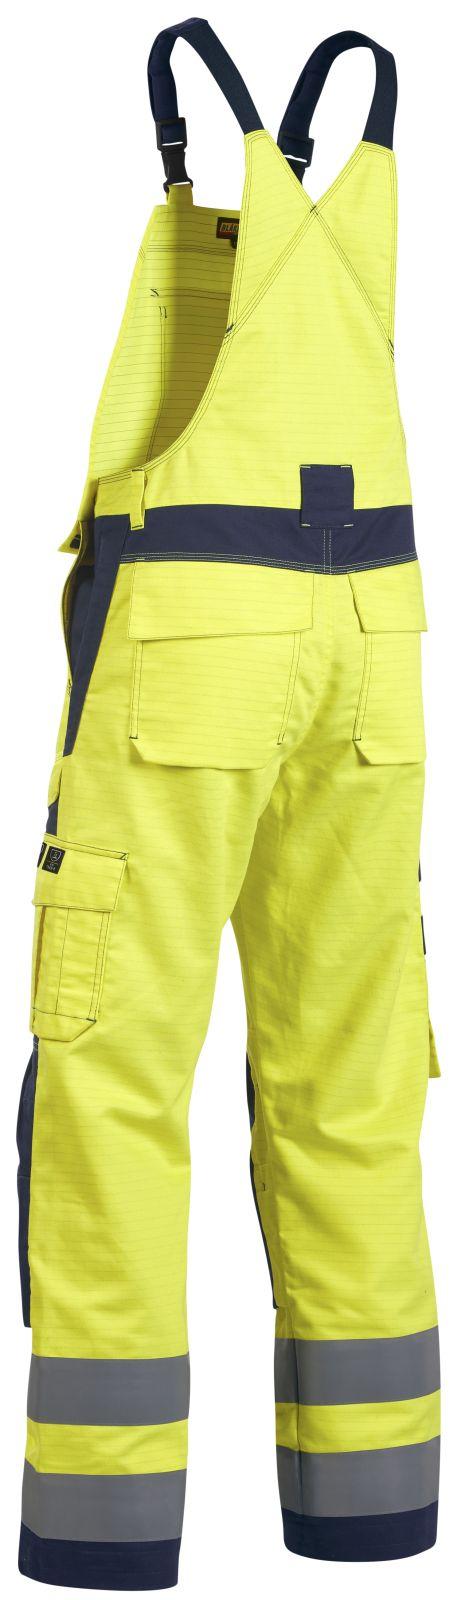 Blaklader Amerikaanse overalls 26081506 Multinorm geel-marineblauw(3389)